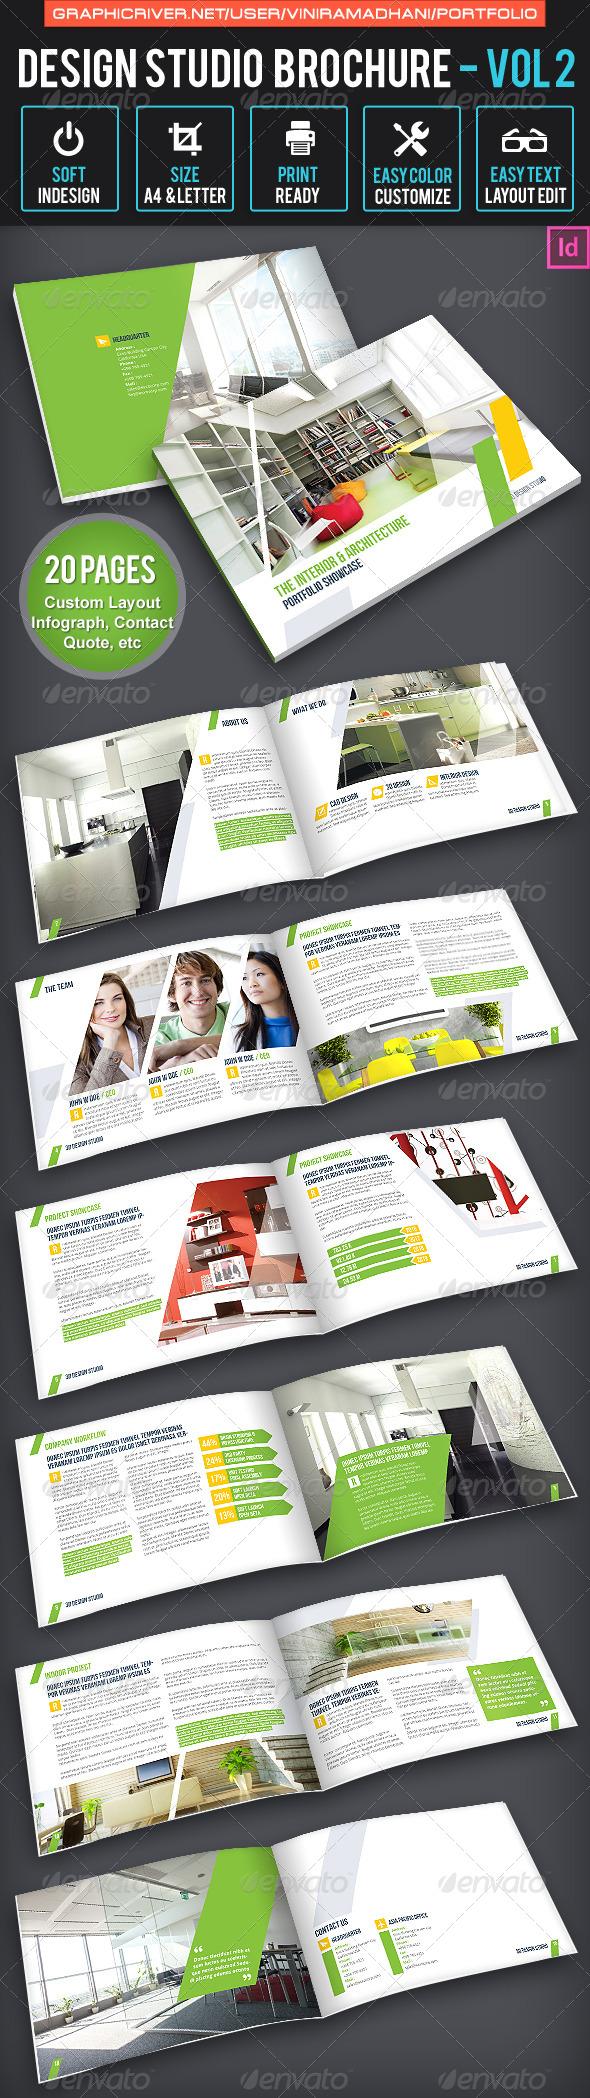 GraphicRiver Design Studio Brochure Volume 2 6632977